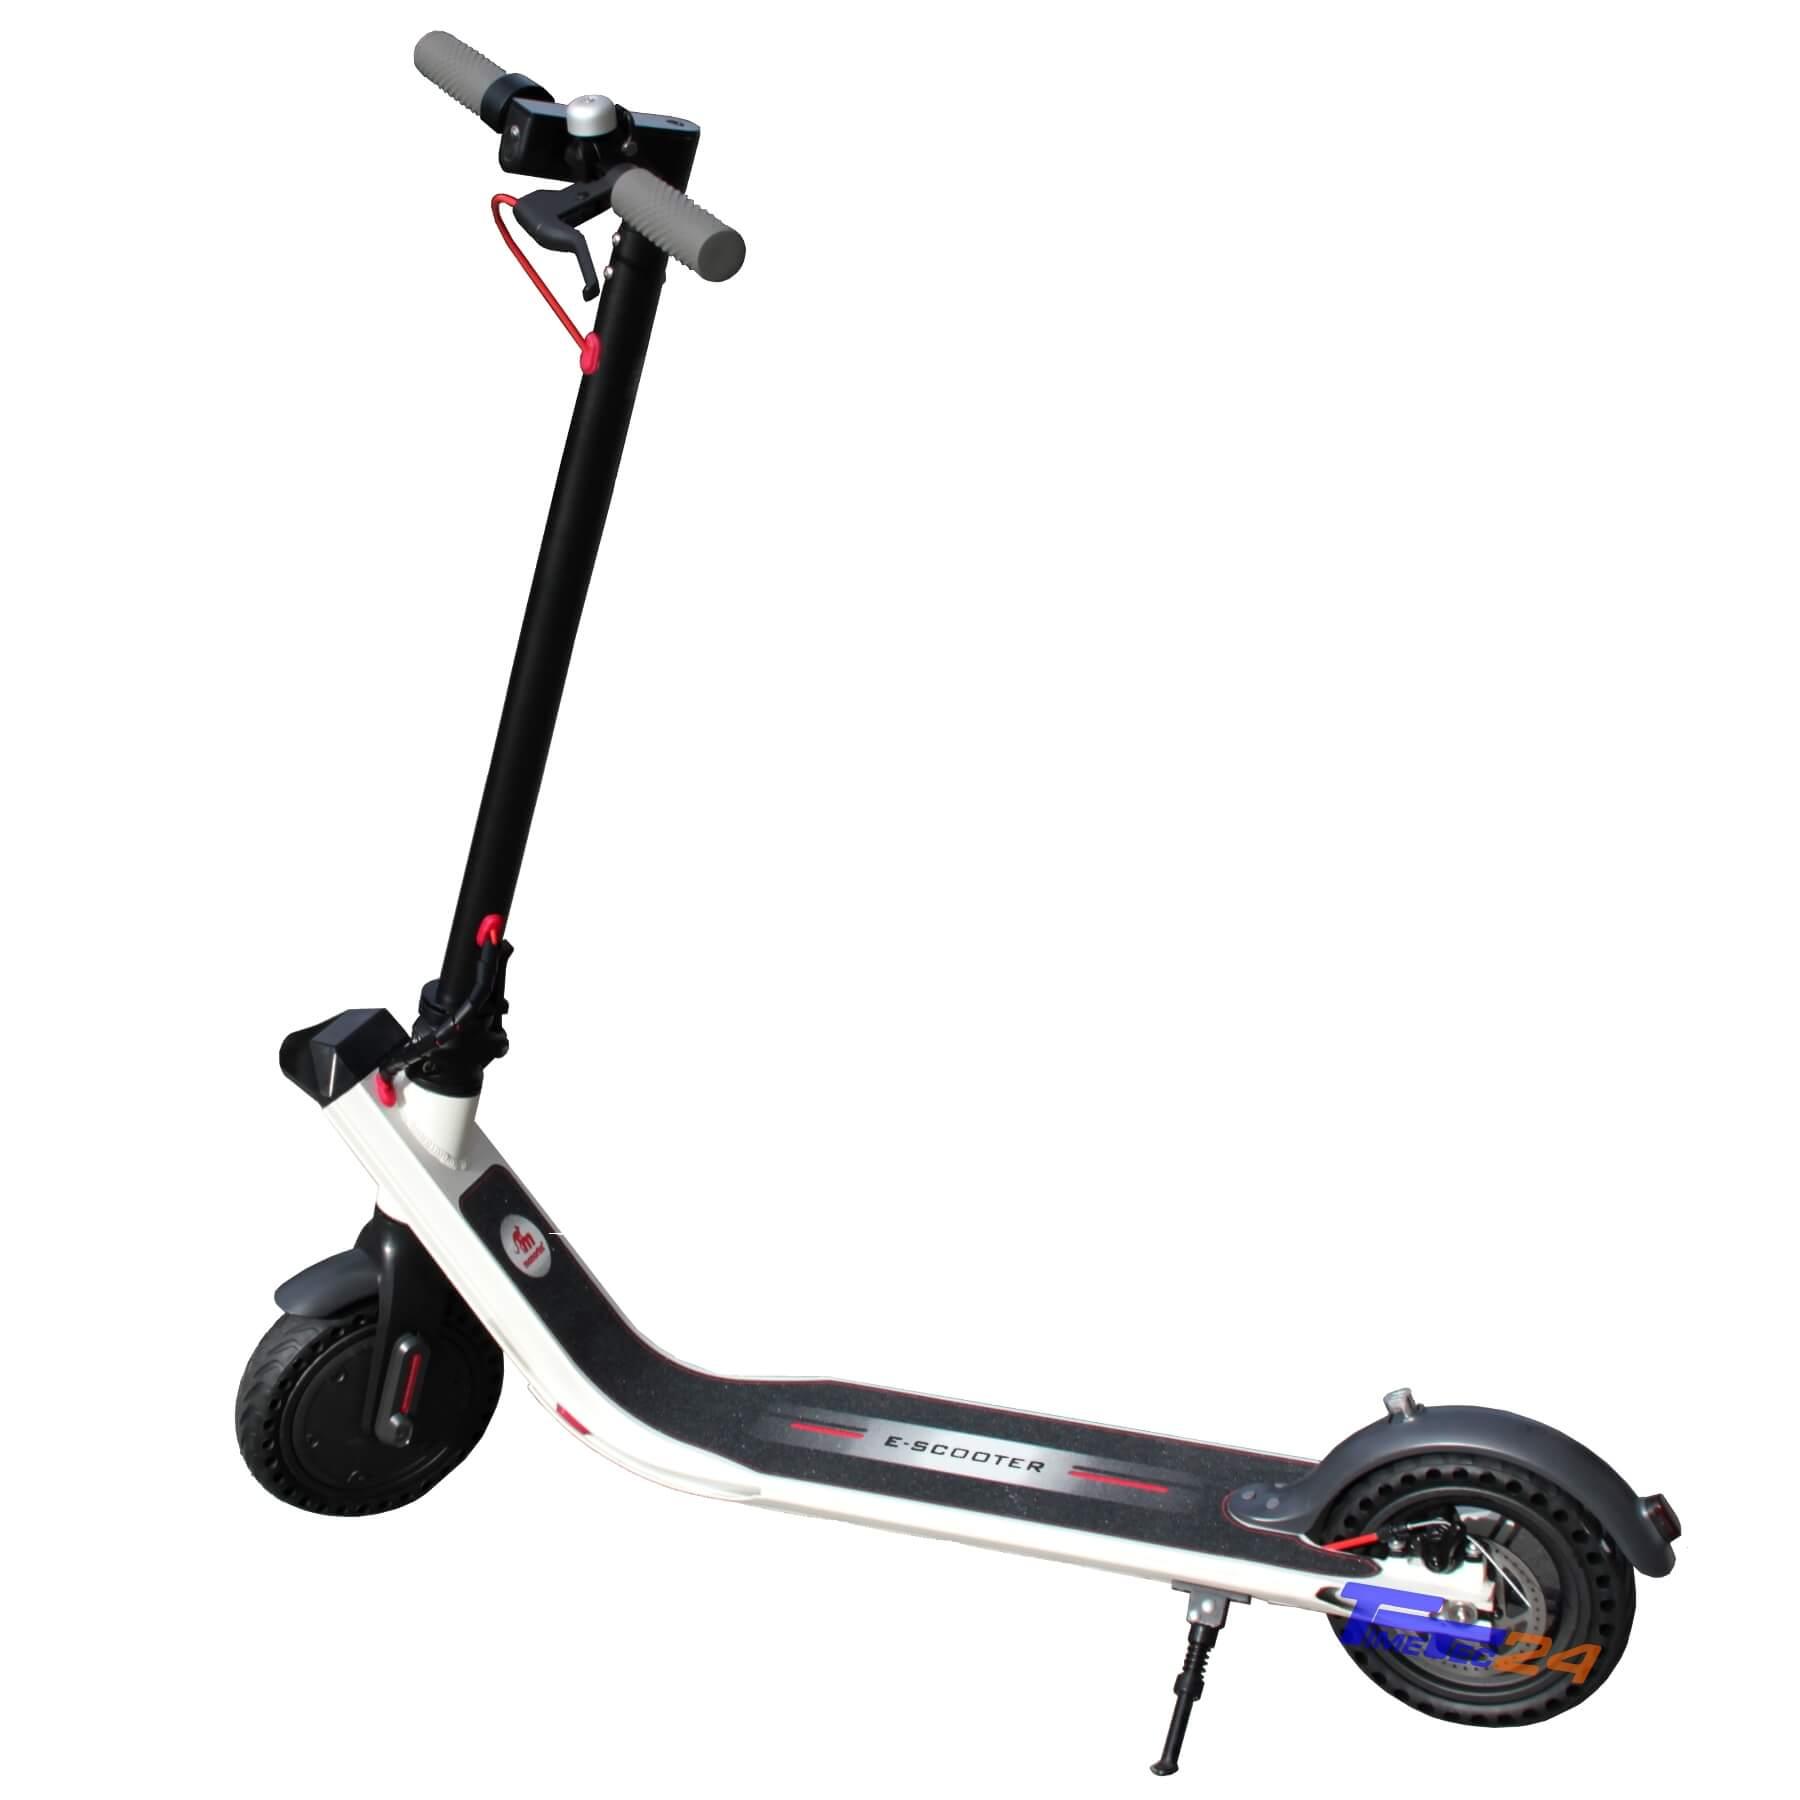 elektroroller e scooter city e roller faltbar 250watt mode. Black Bedroom Furniture Sets. Home Design Ideas